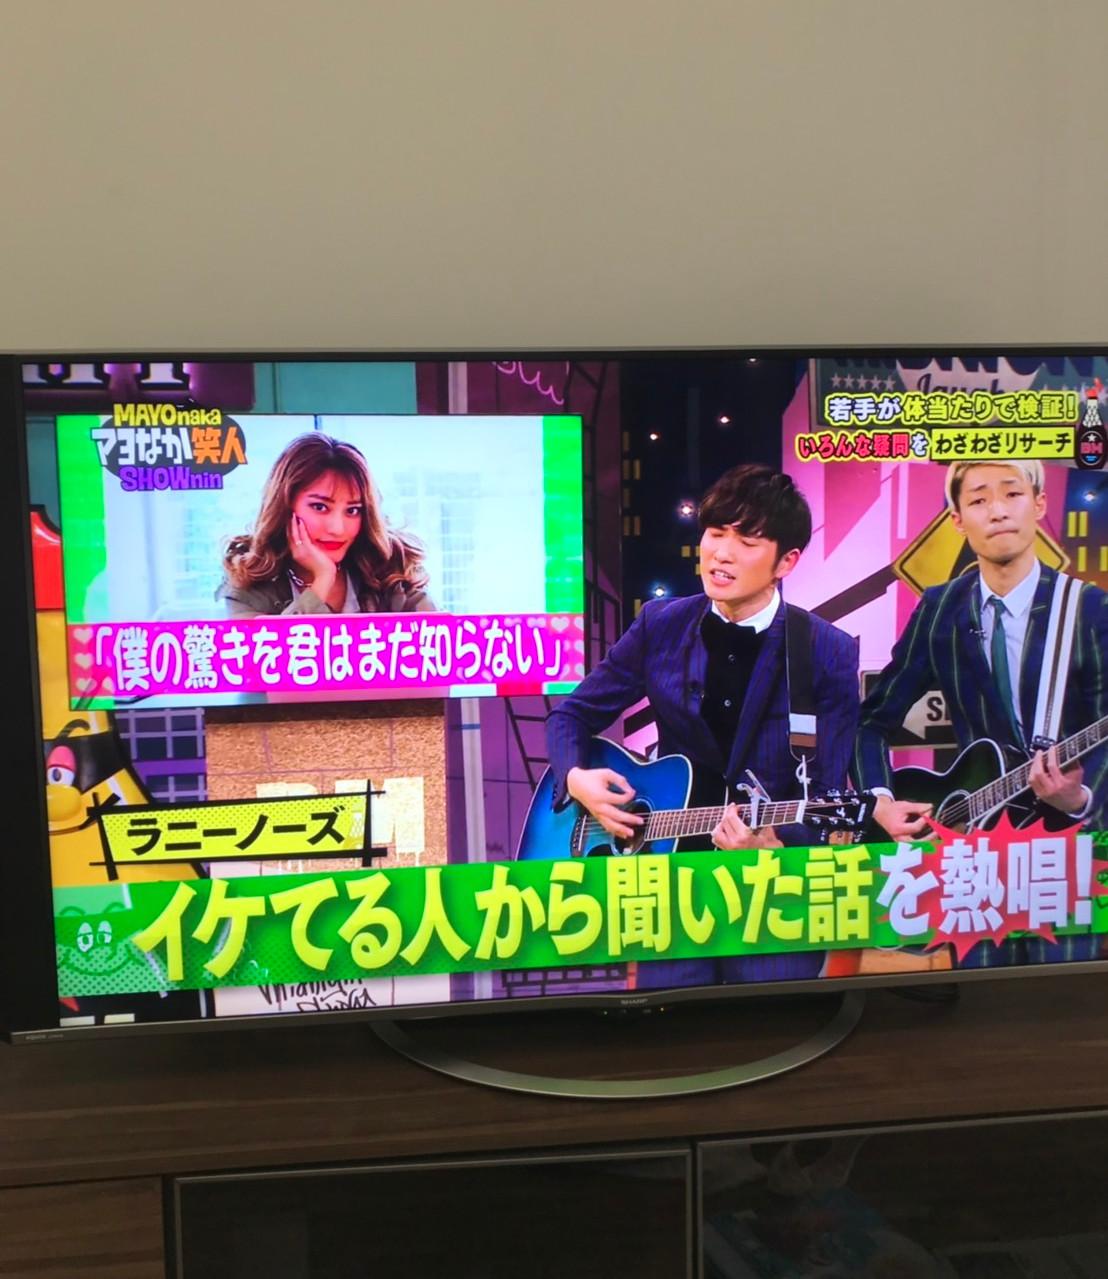 popupstore,マヨなか笑人,lineupstore,読売TV